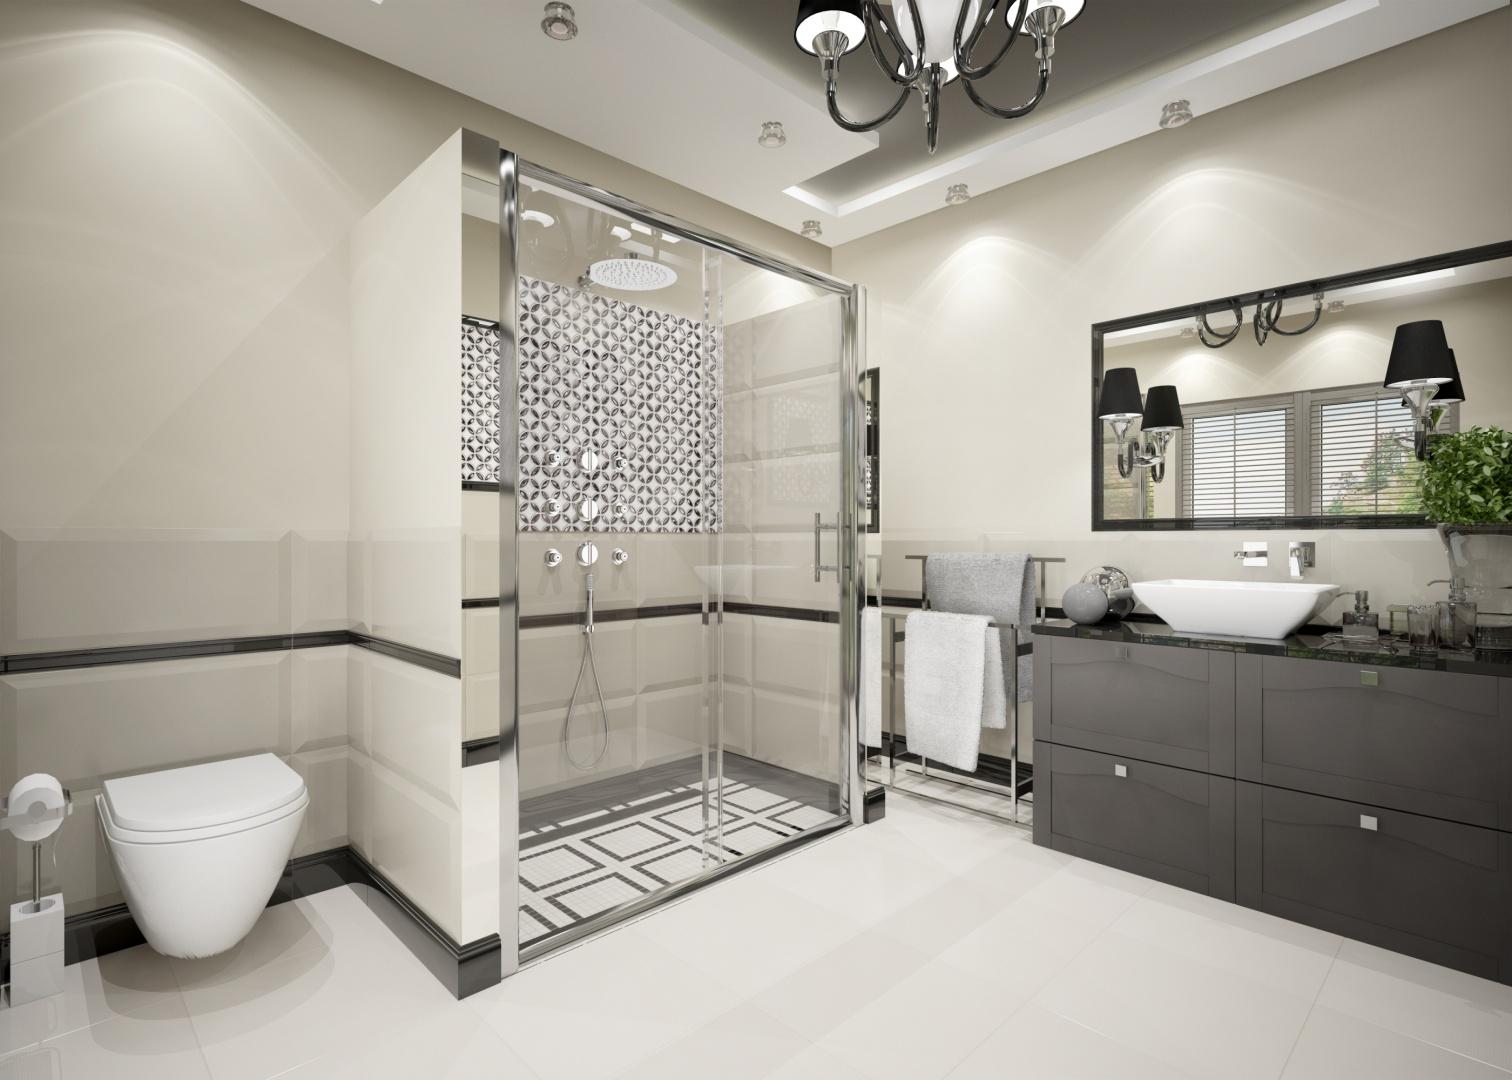 Deante łazienka glamour proj. Anna Winecka.